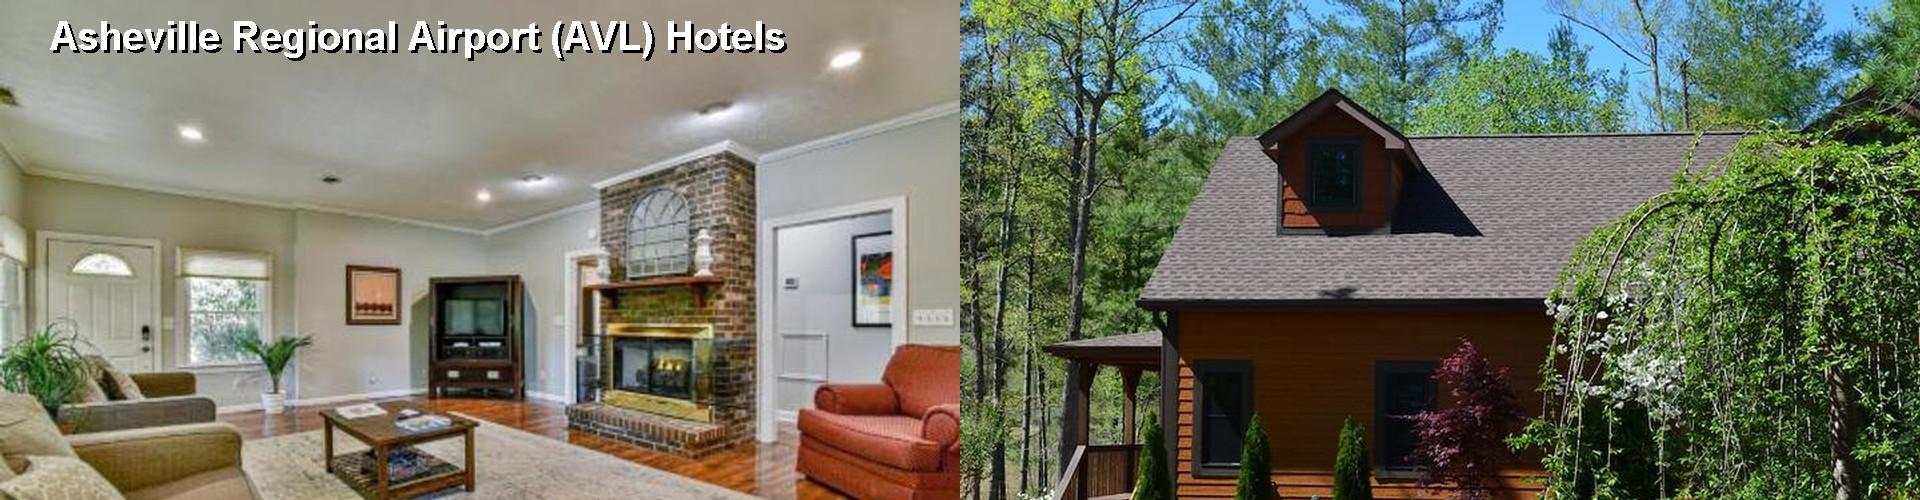 45 hotels near asheville regional airport avl nc. Black Bedroom Furniture Sets. Home Design Ideas